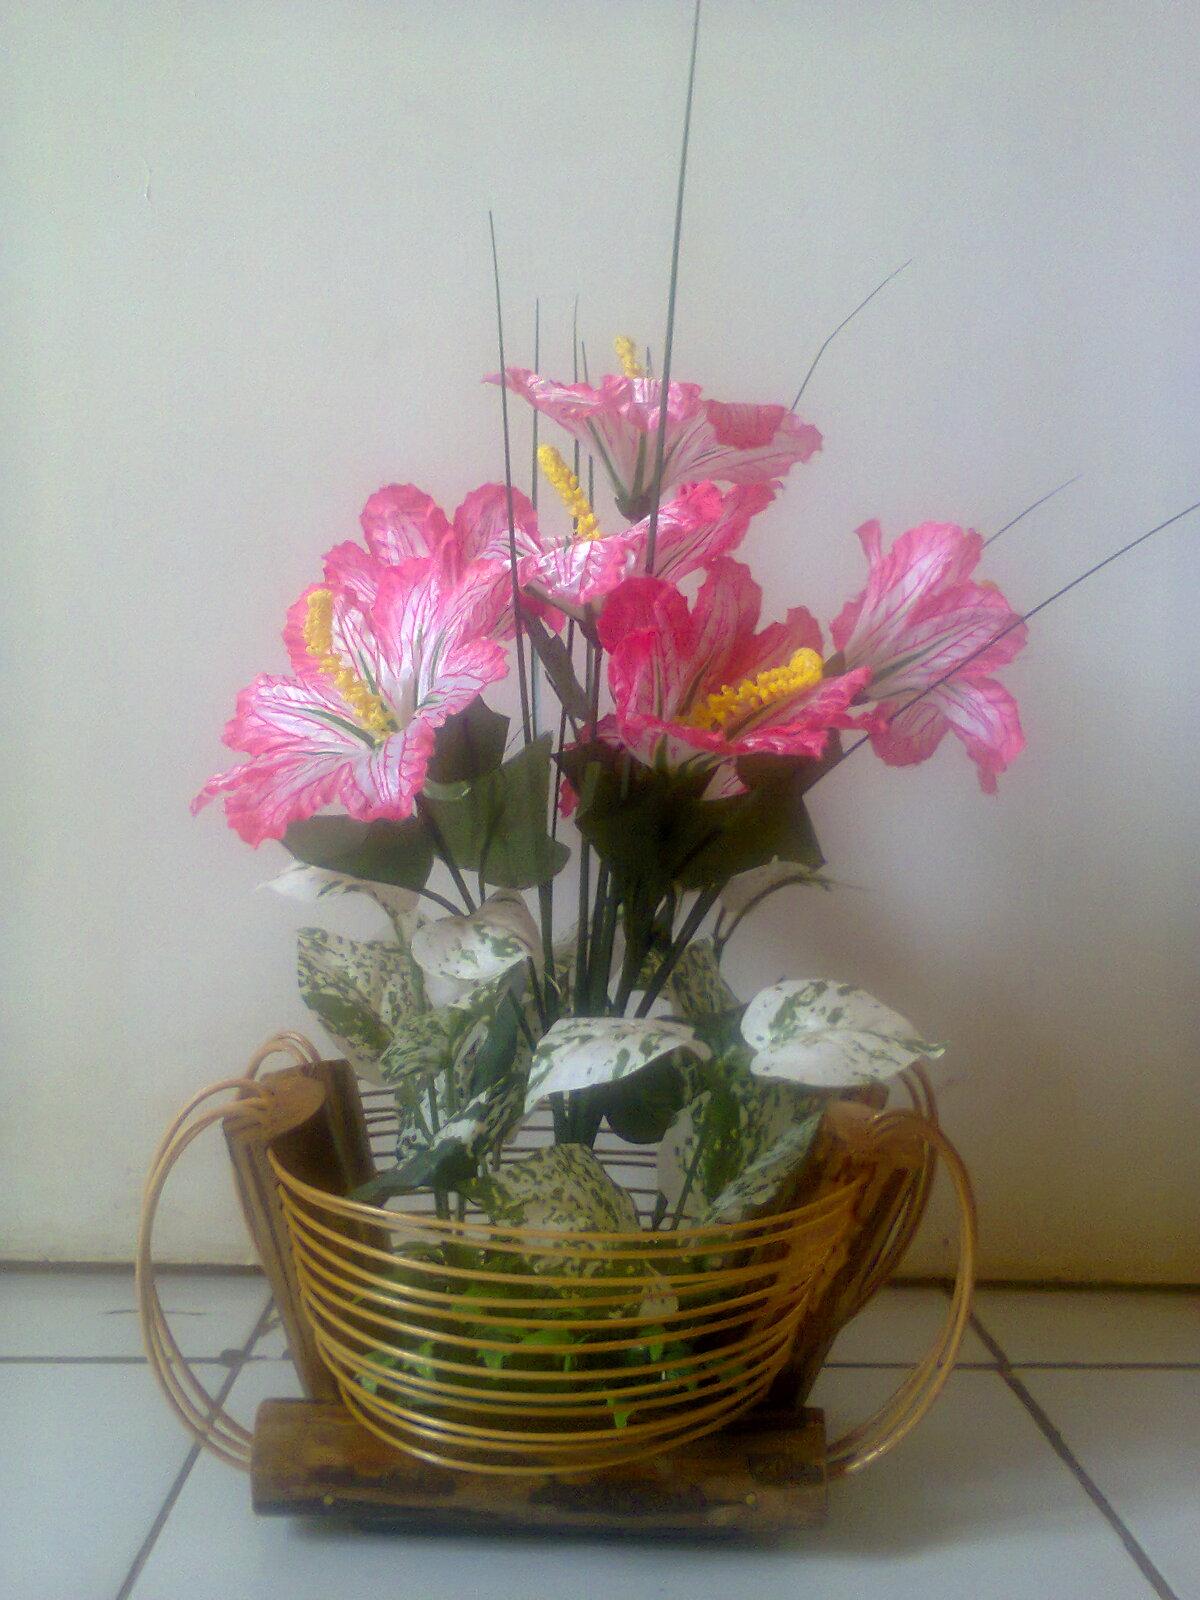 Vas Bunga Rotan dan Kayu | Kerajinan Rotan,Kayu dan Bambu